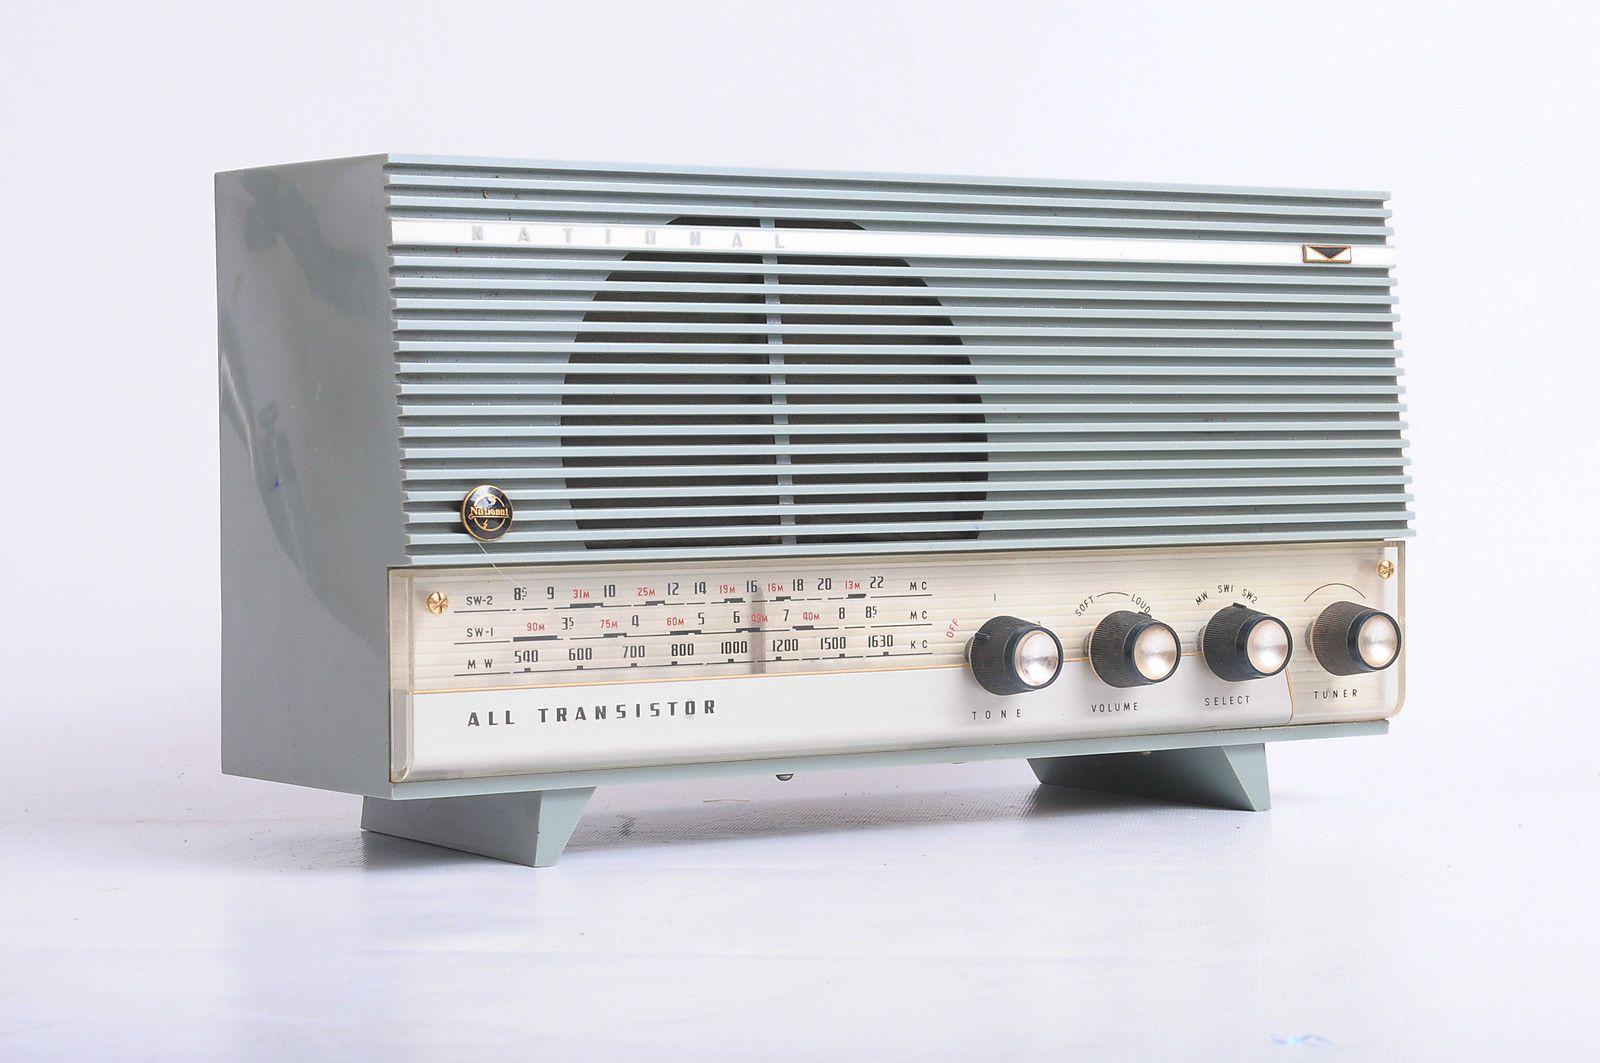 Vintage National Panasonic Ab 361 Transistor Radio Transistor Radio Transistors Radio